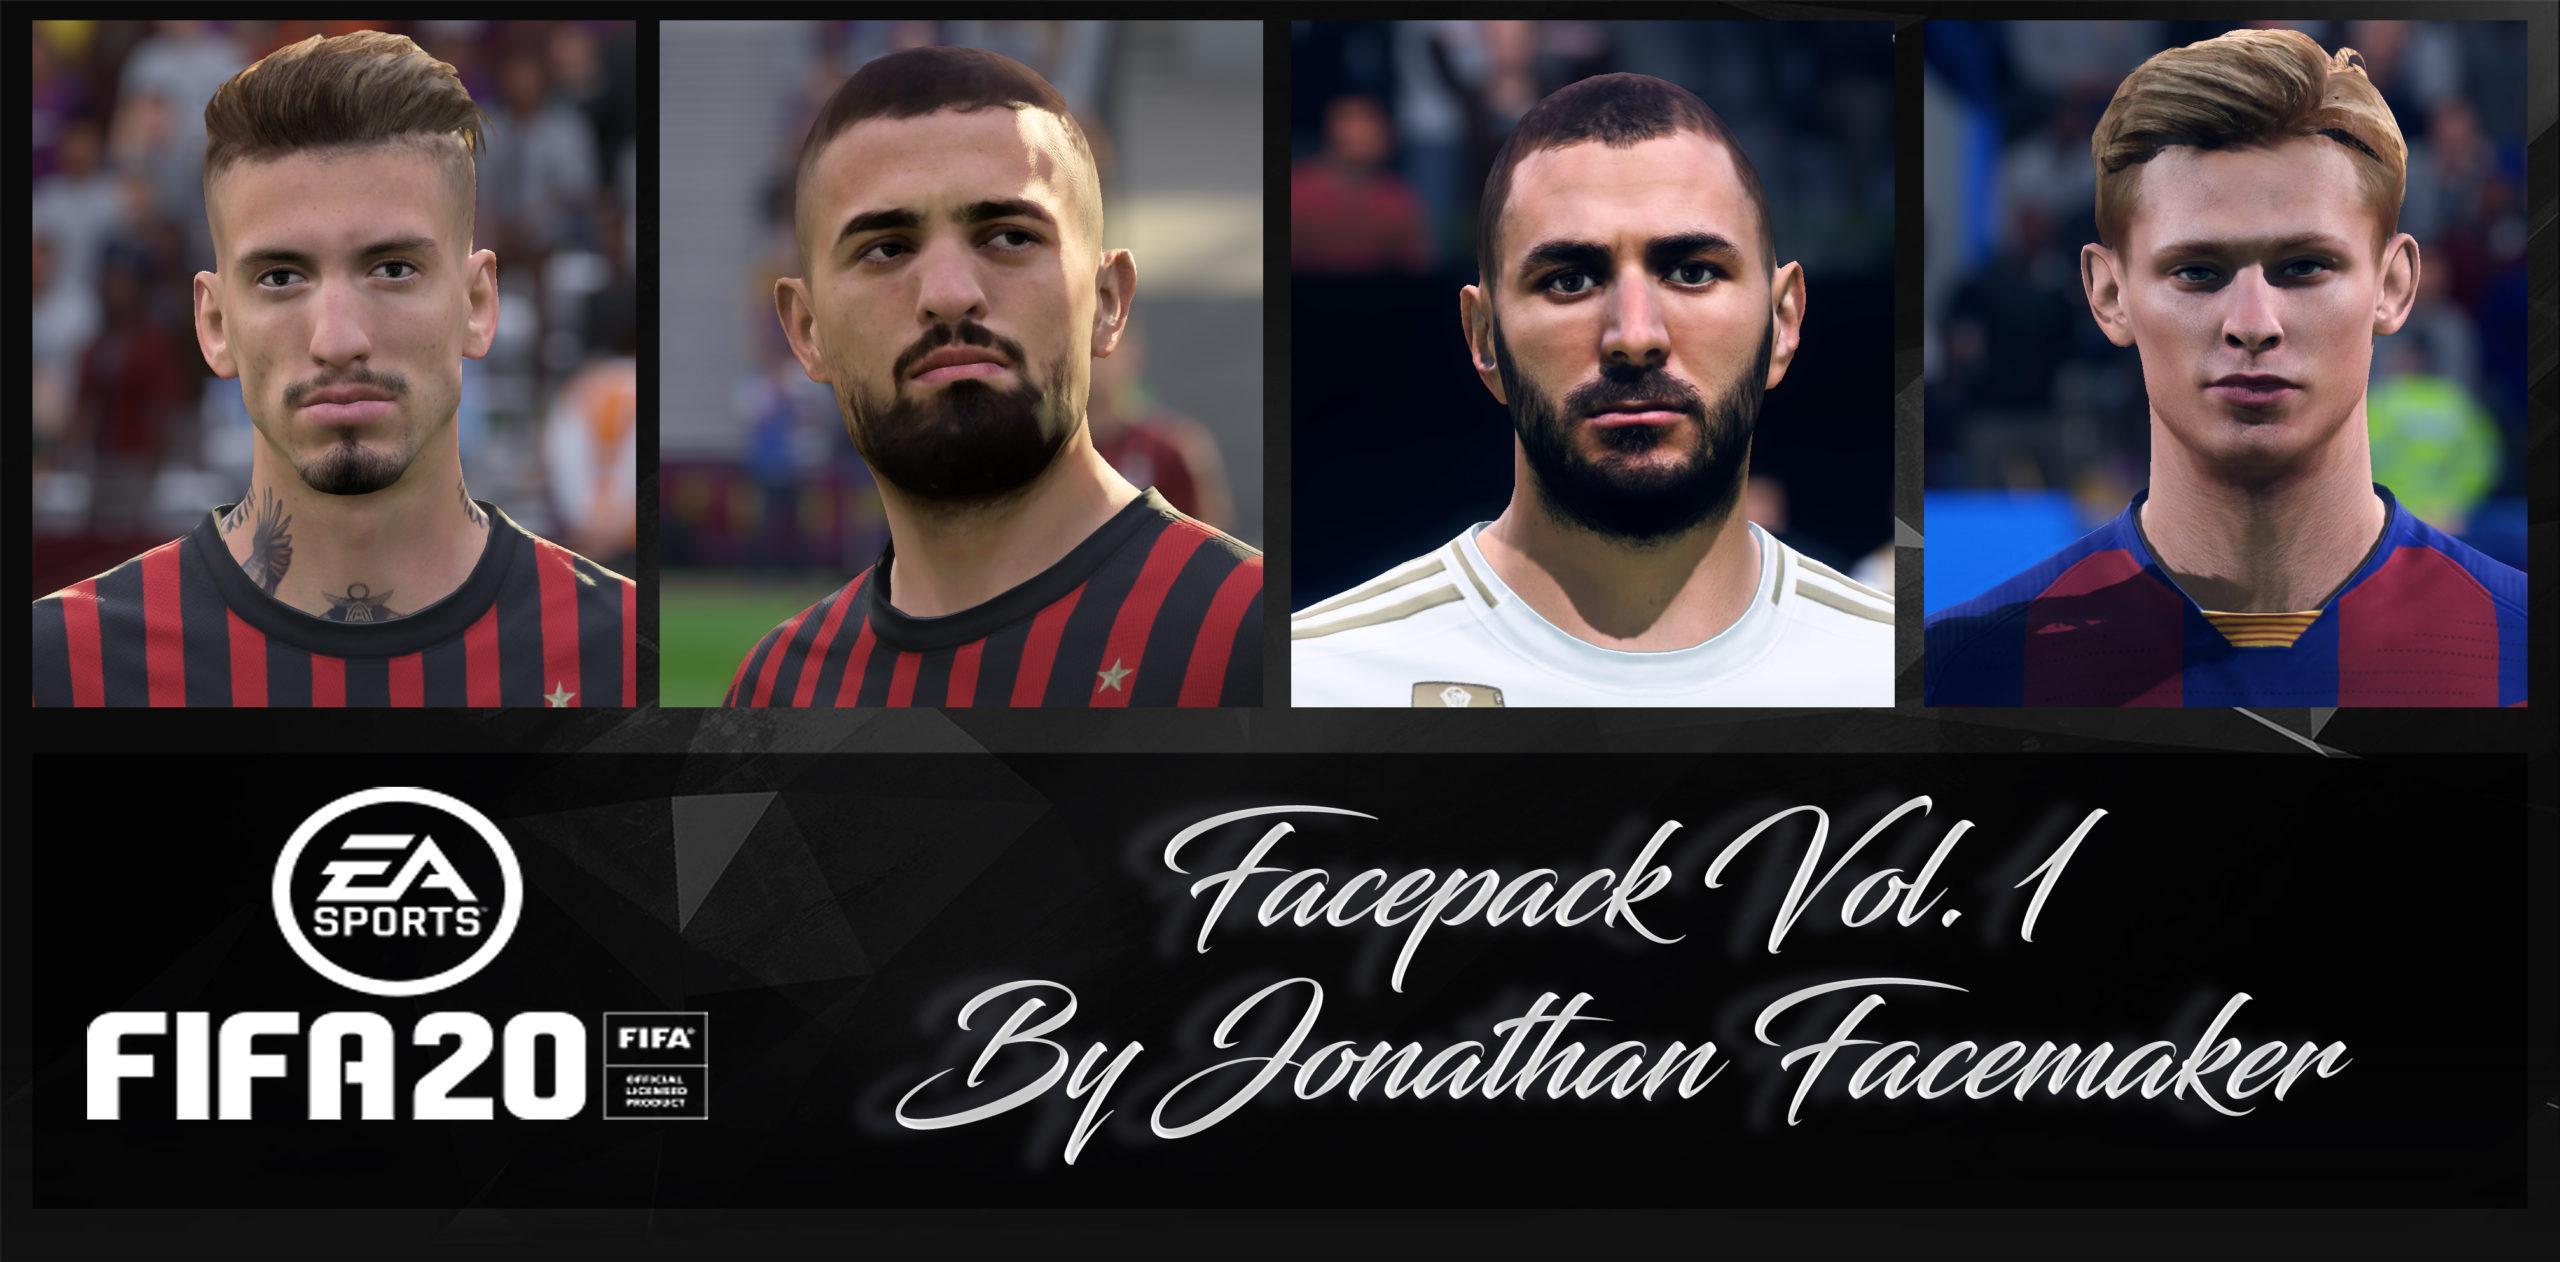 Facepack Vol. 1 By Jonathan Facemaker